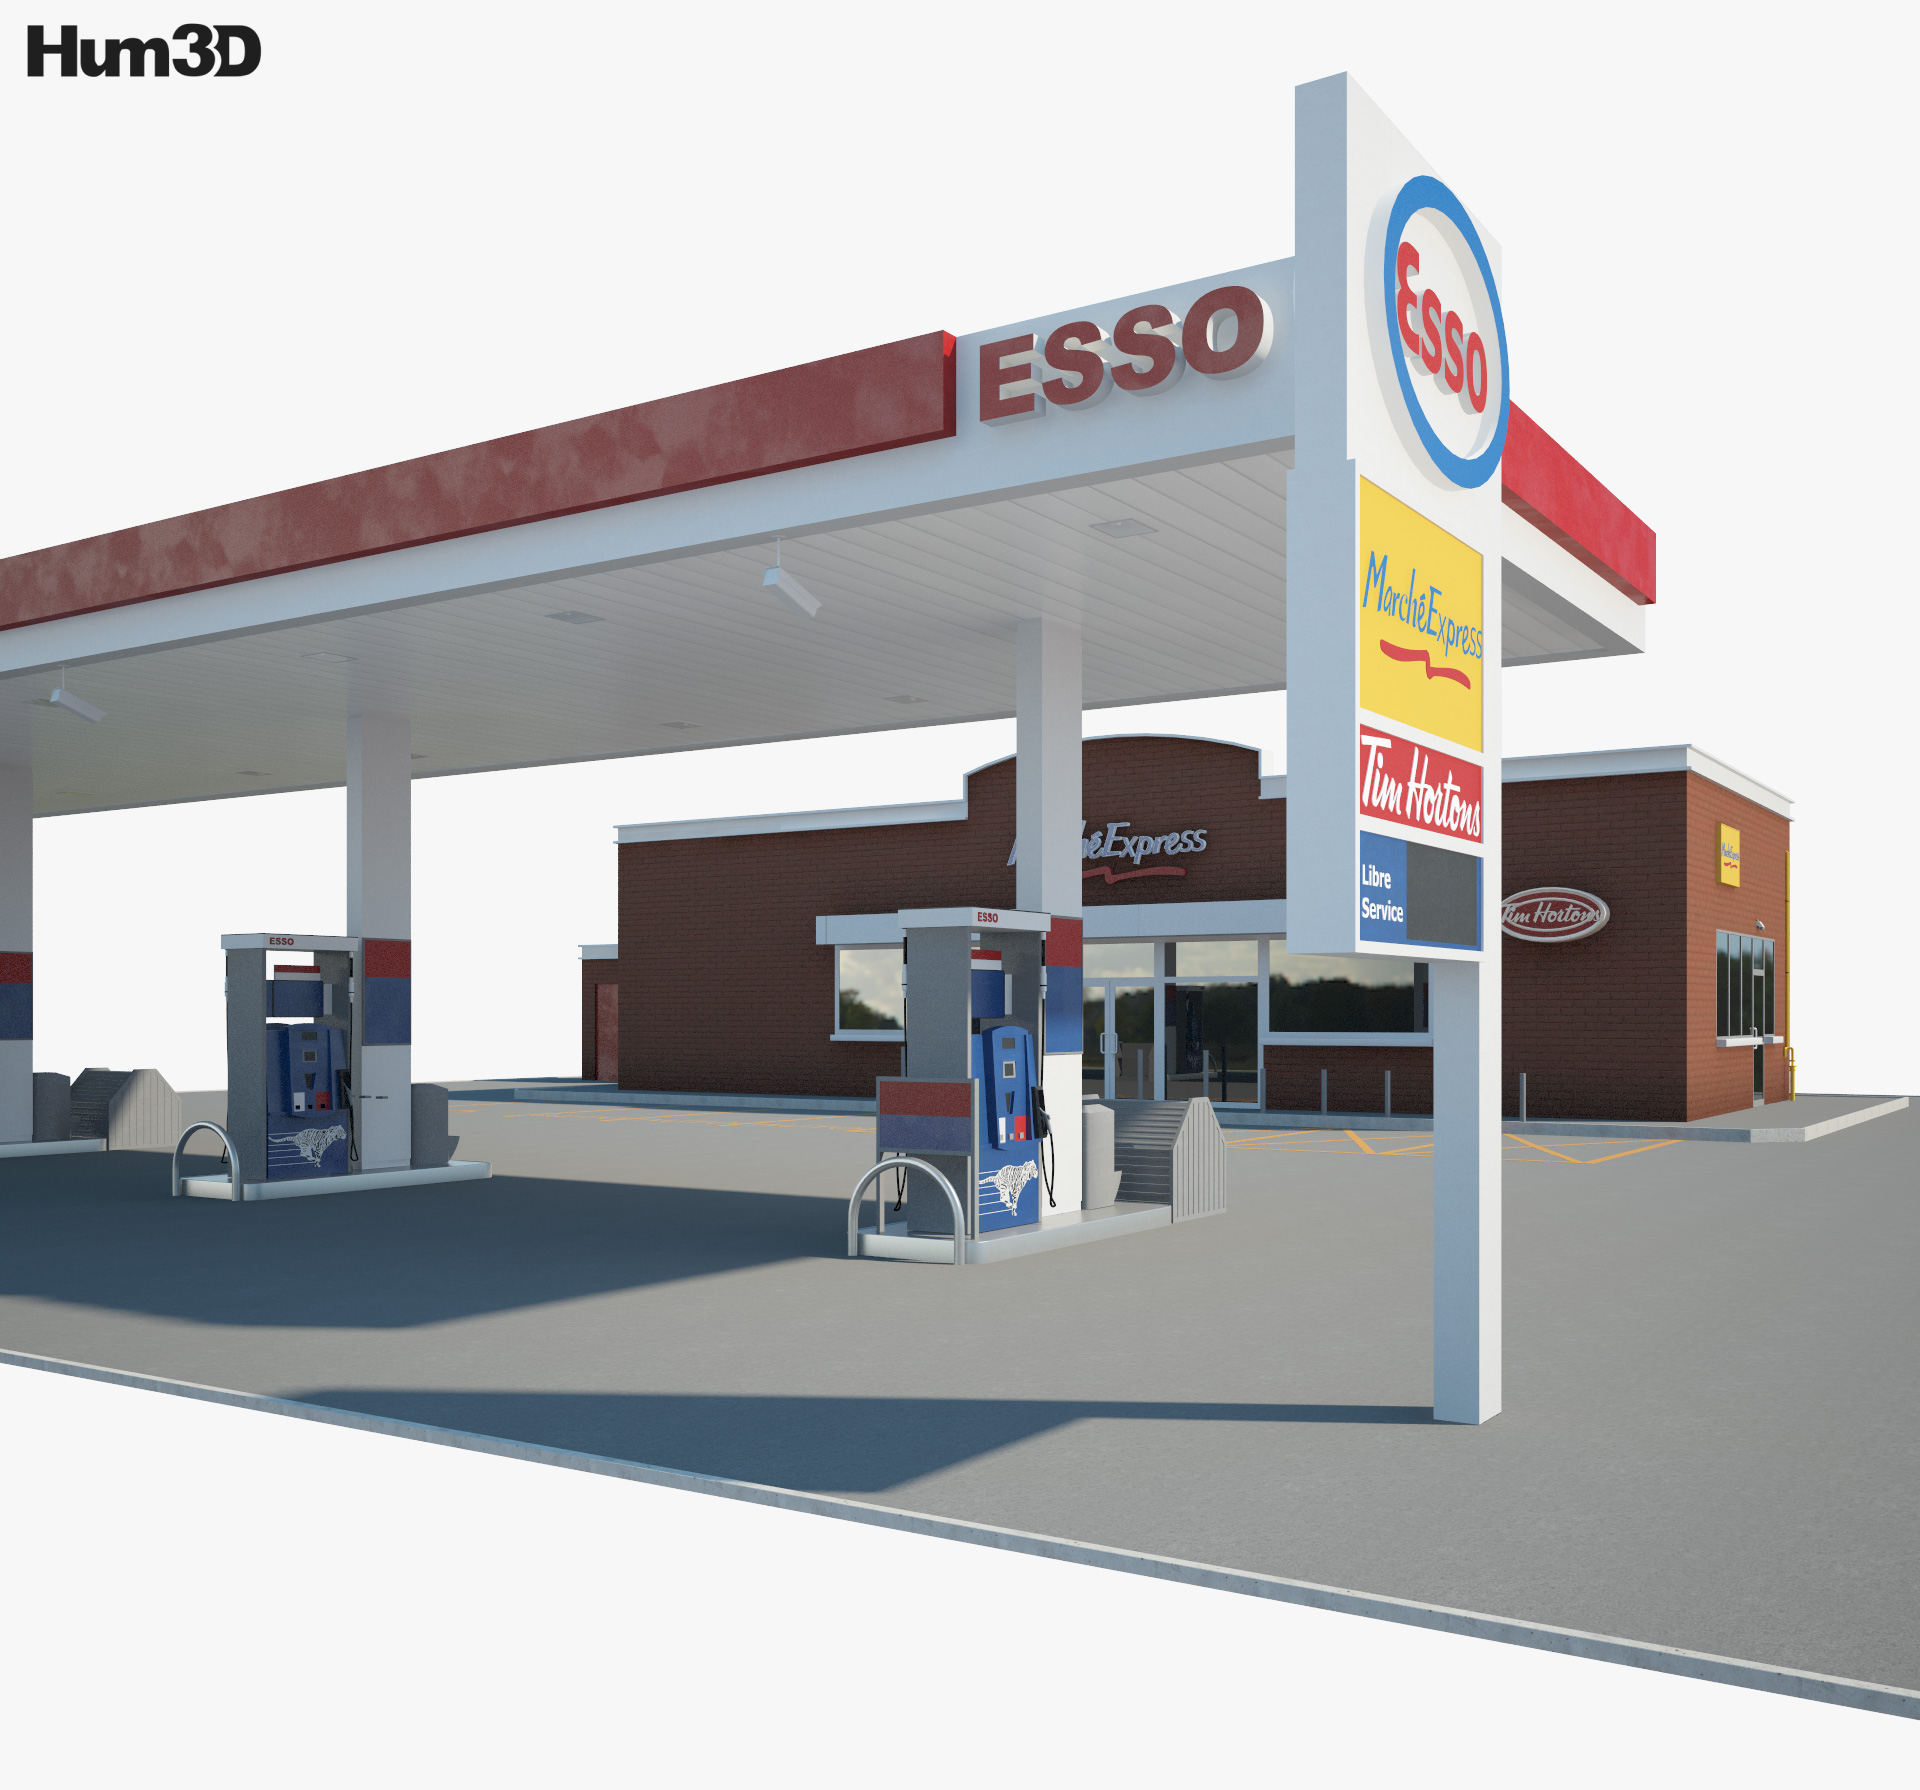 ESSO gas station 001 3d model